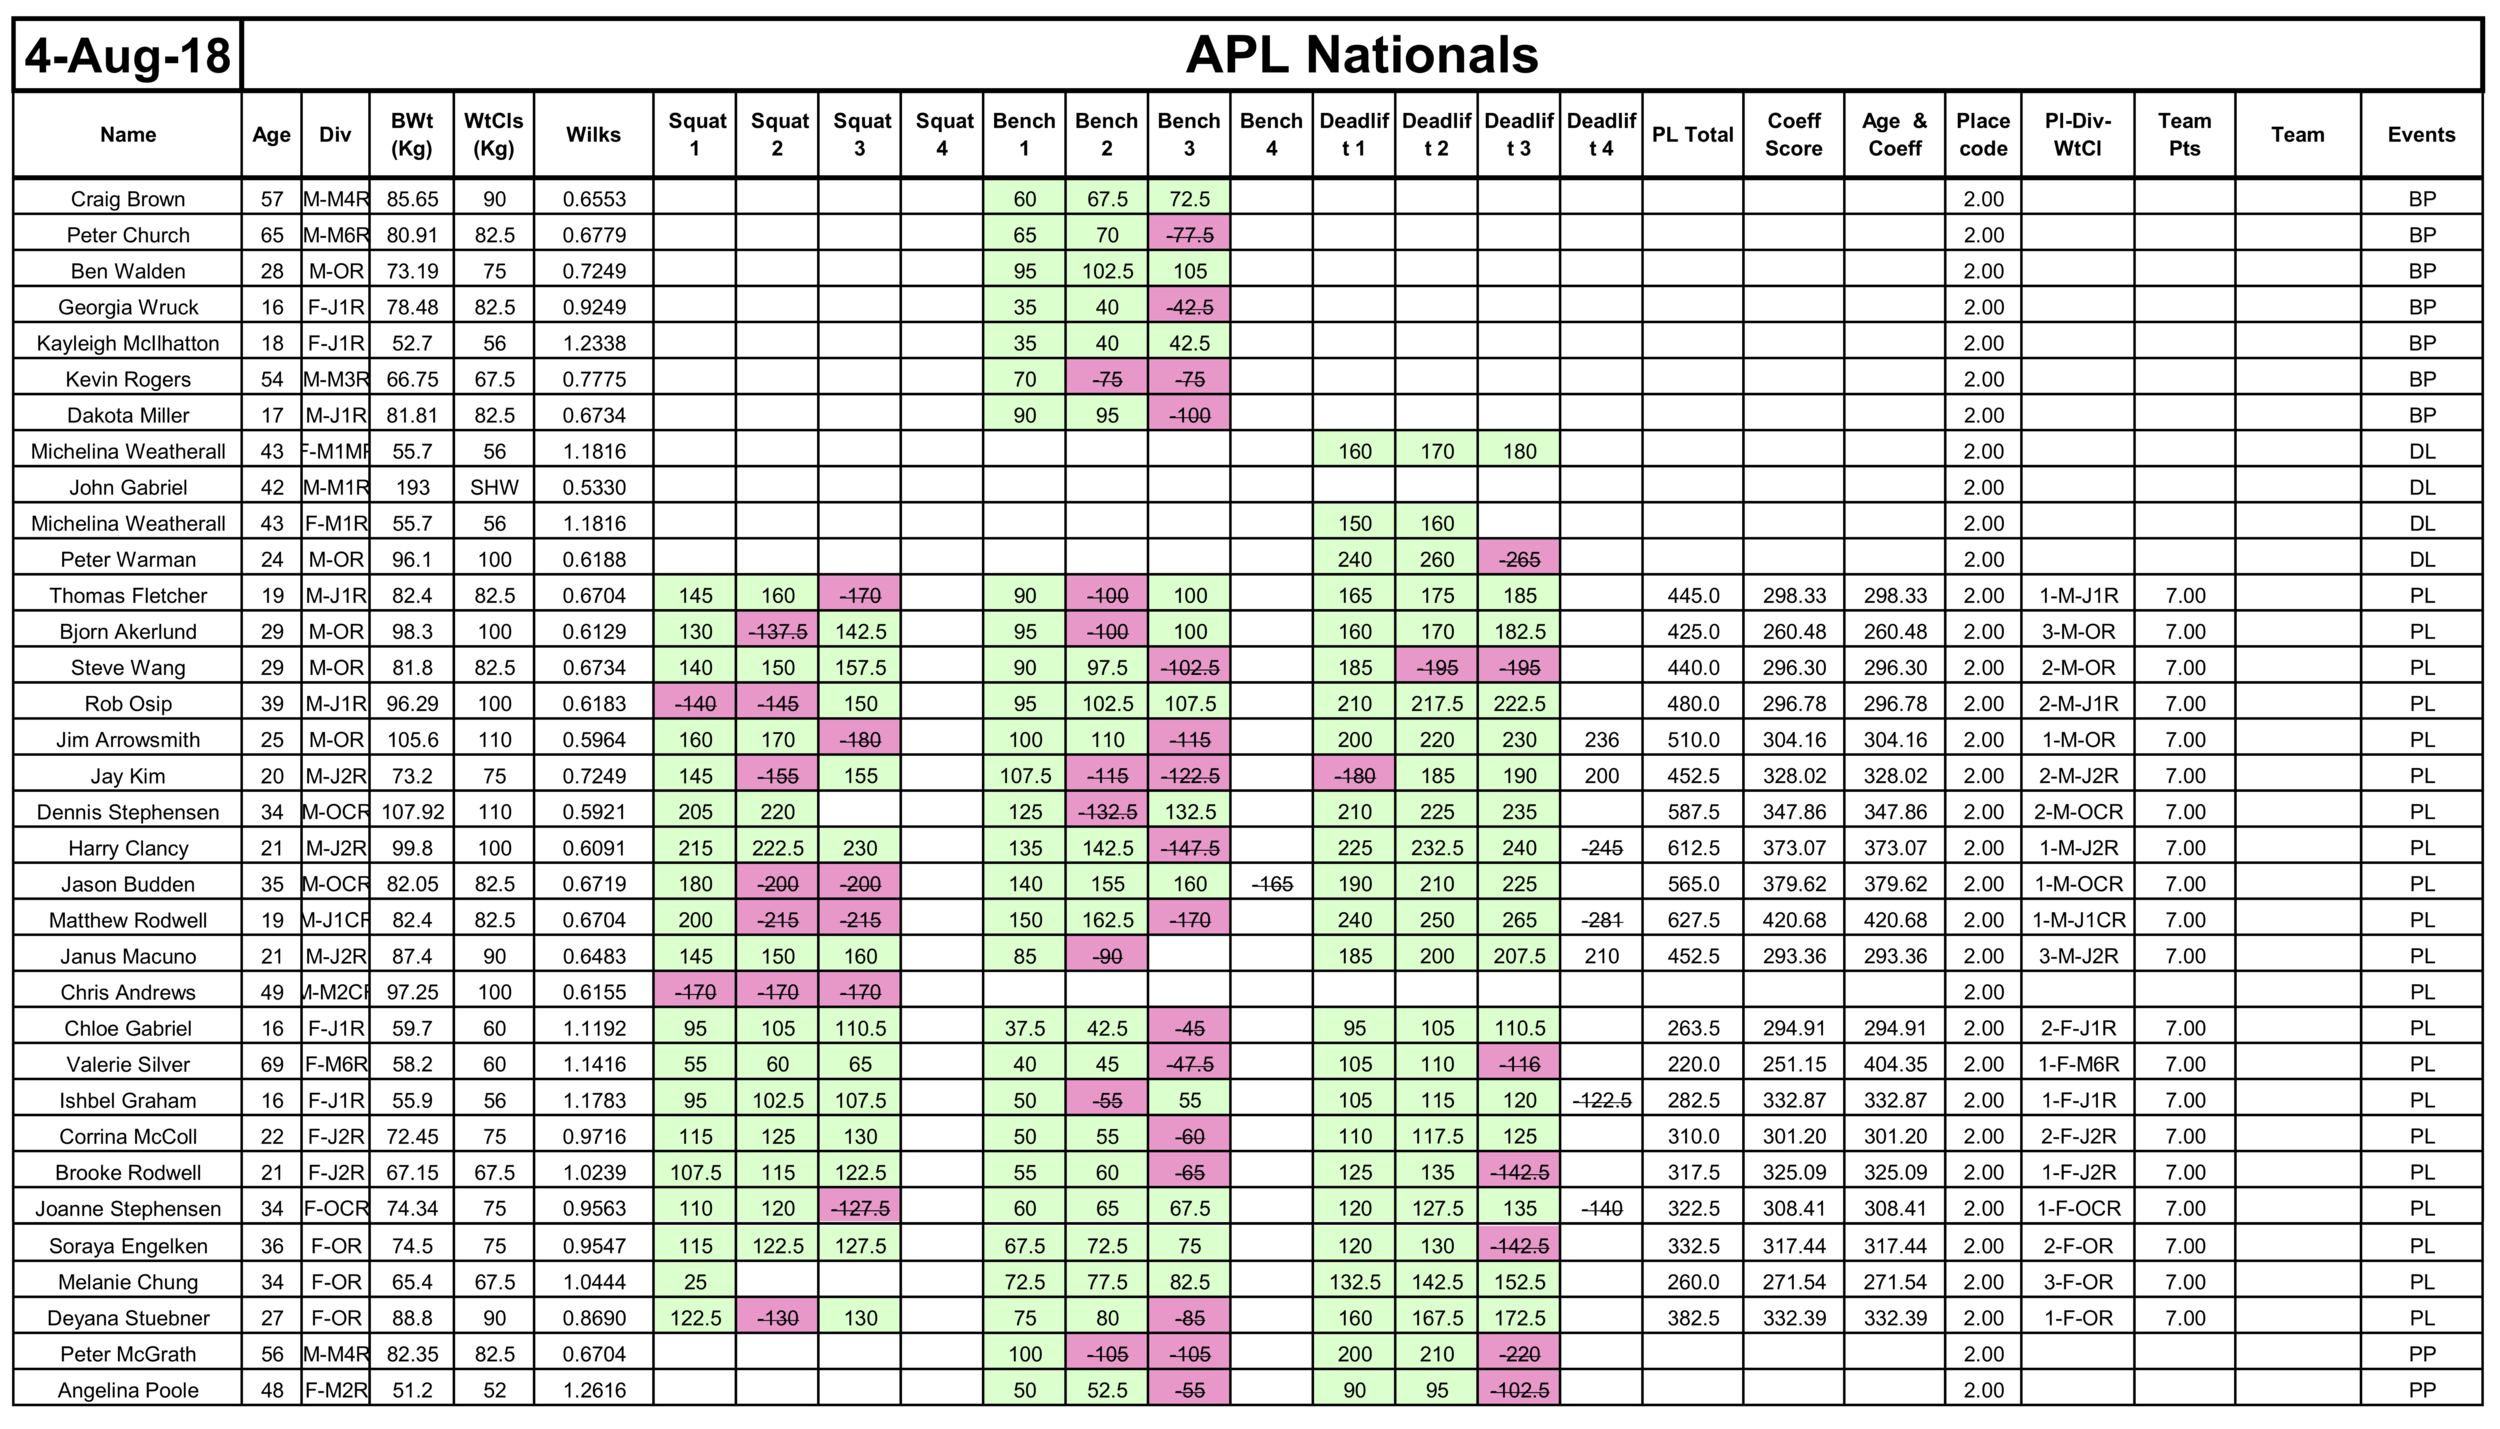 APL Nationals 2018